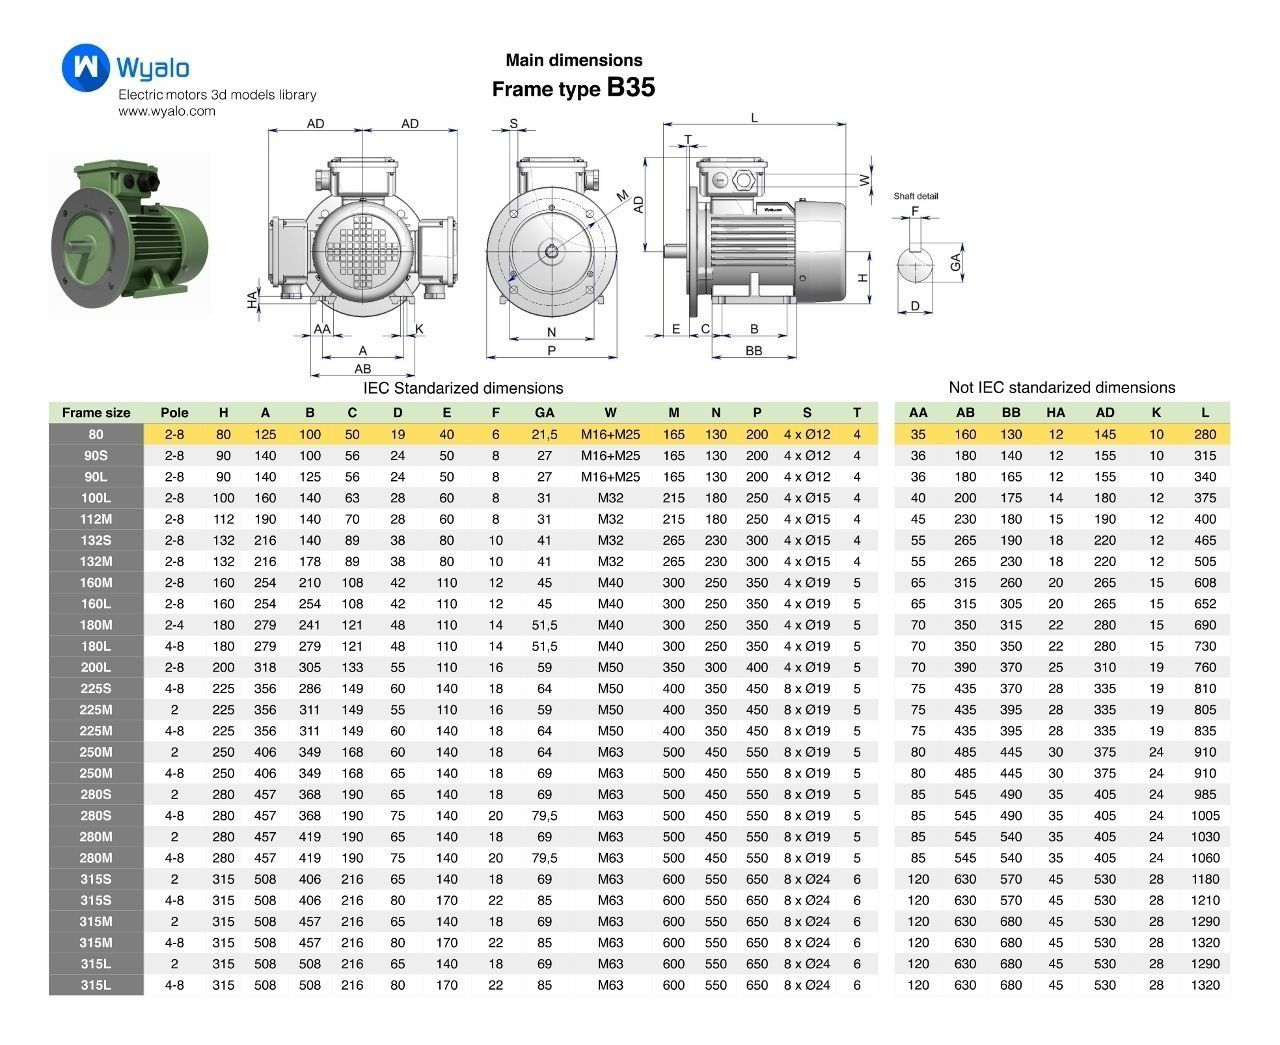 Iec 80 Frame Motor Dimensions | Motorsite.co